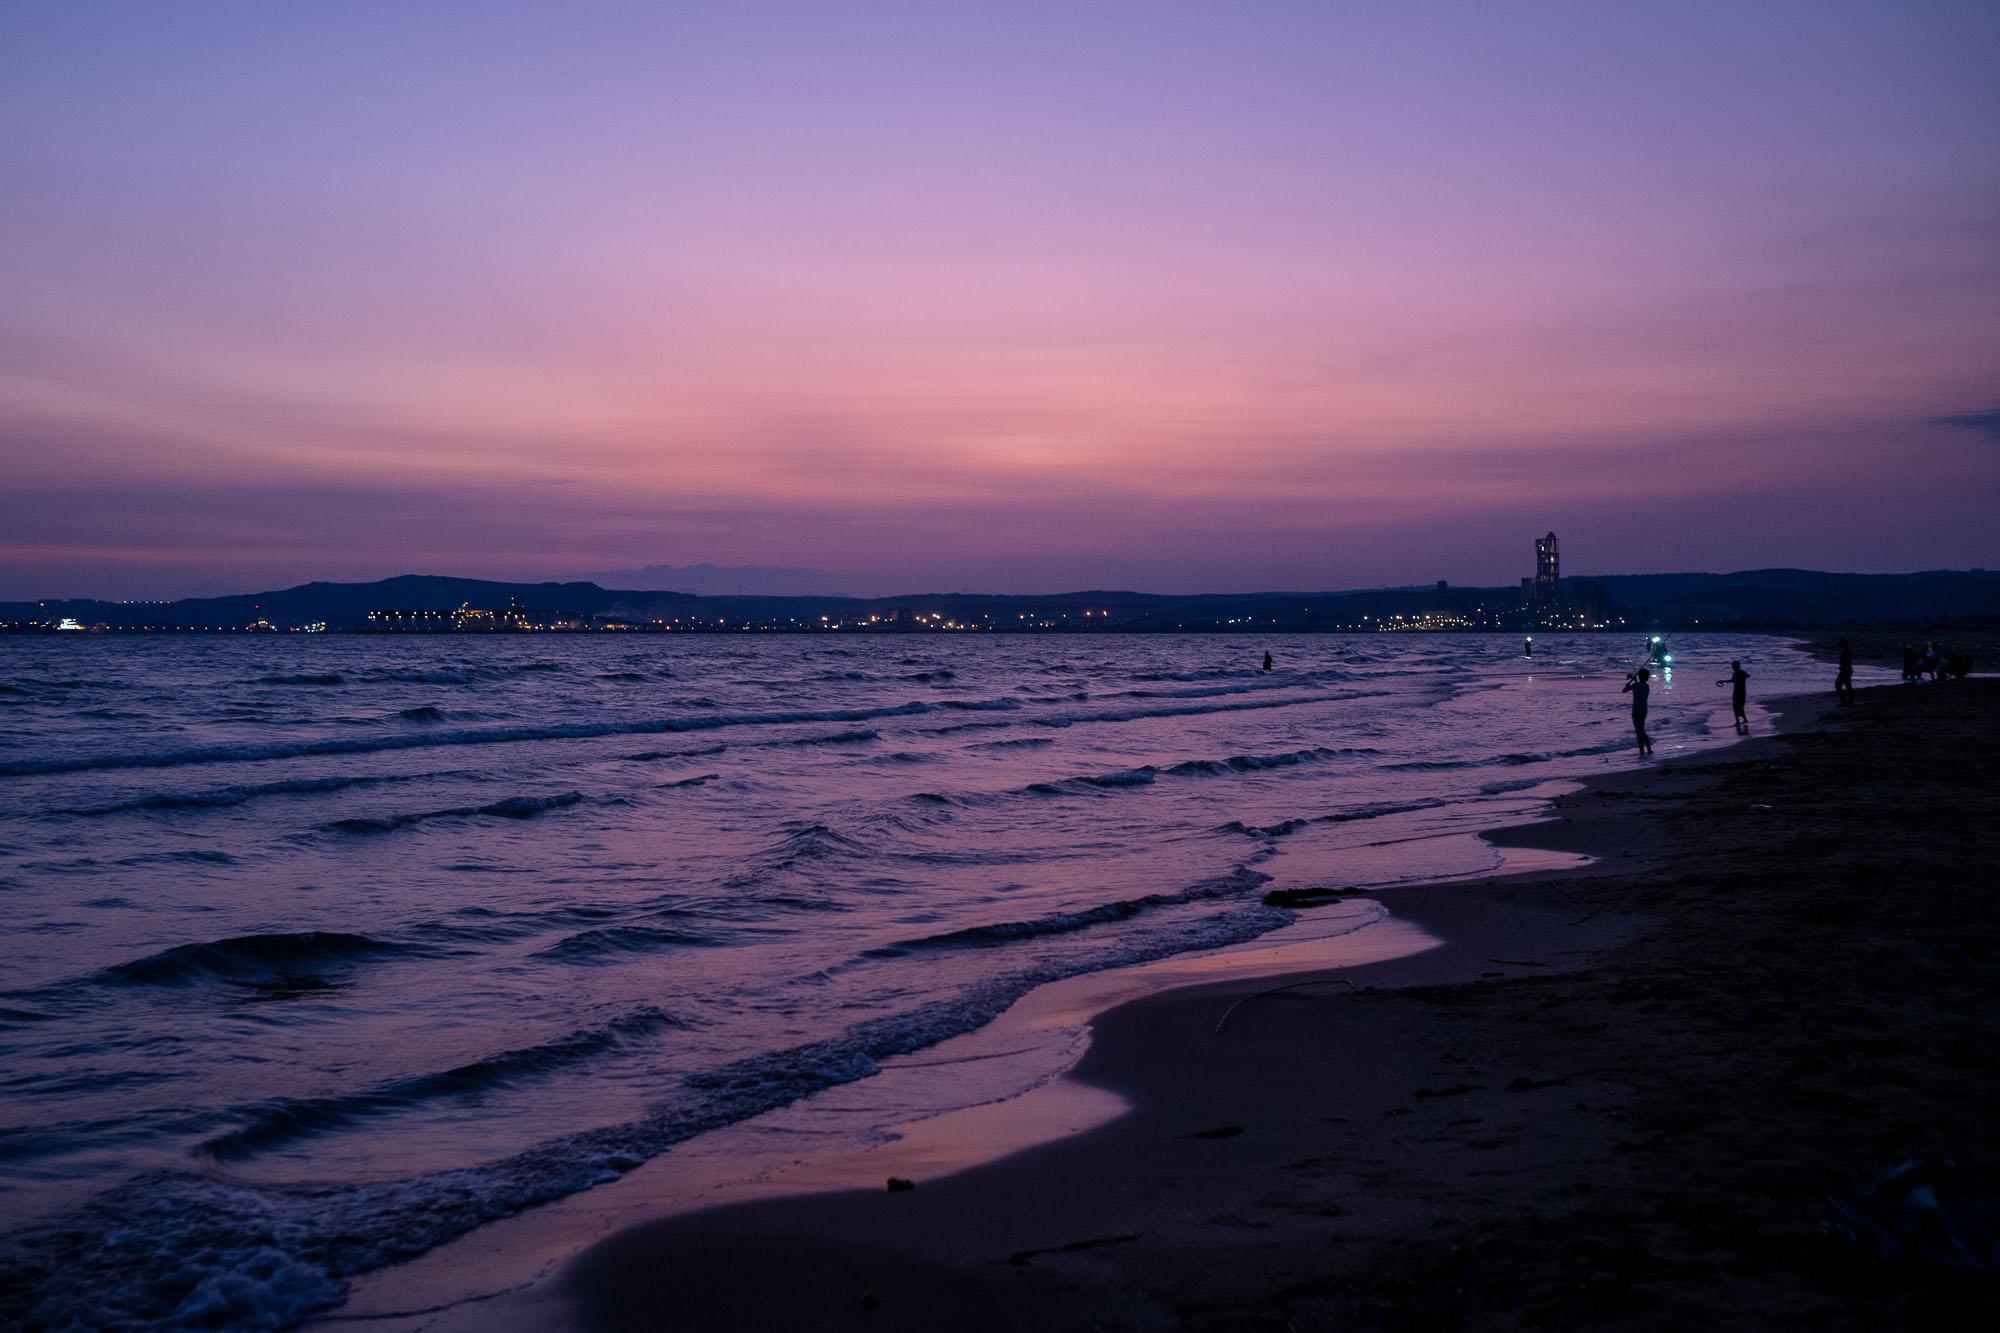 Sunset at Burnaz beach in Hatay, Turkey